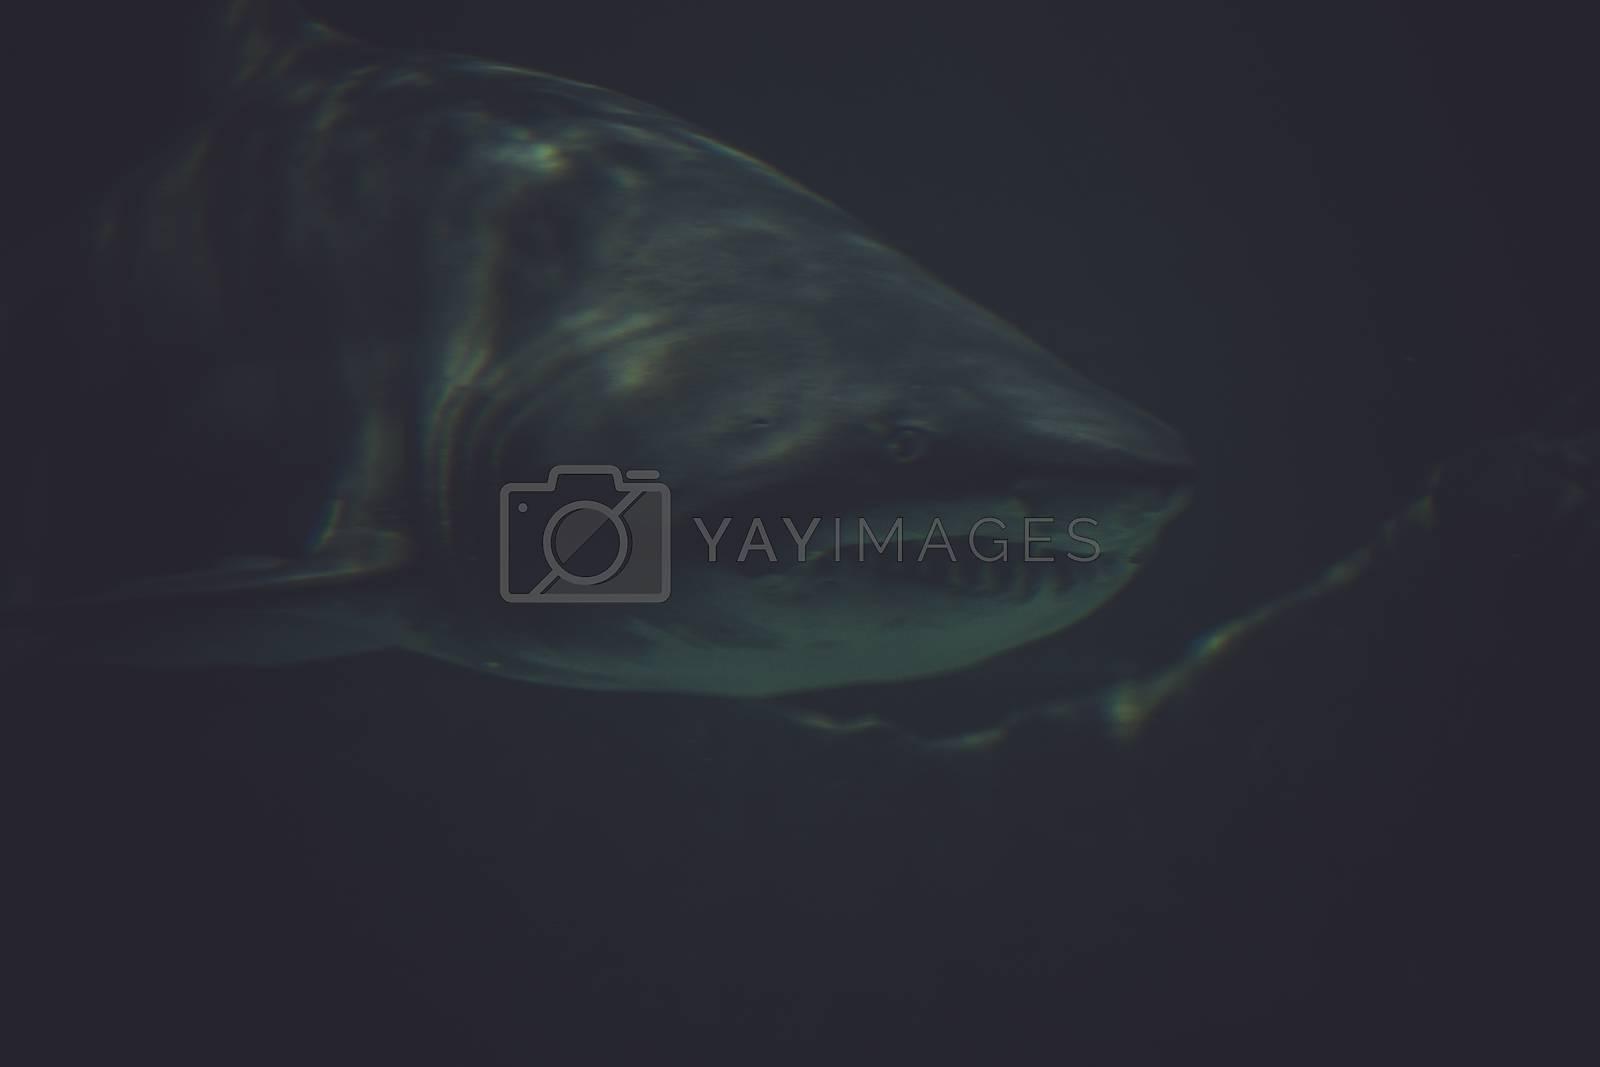 predator, Great Shark Underwater Photo  in the deep blue water.